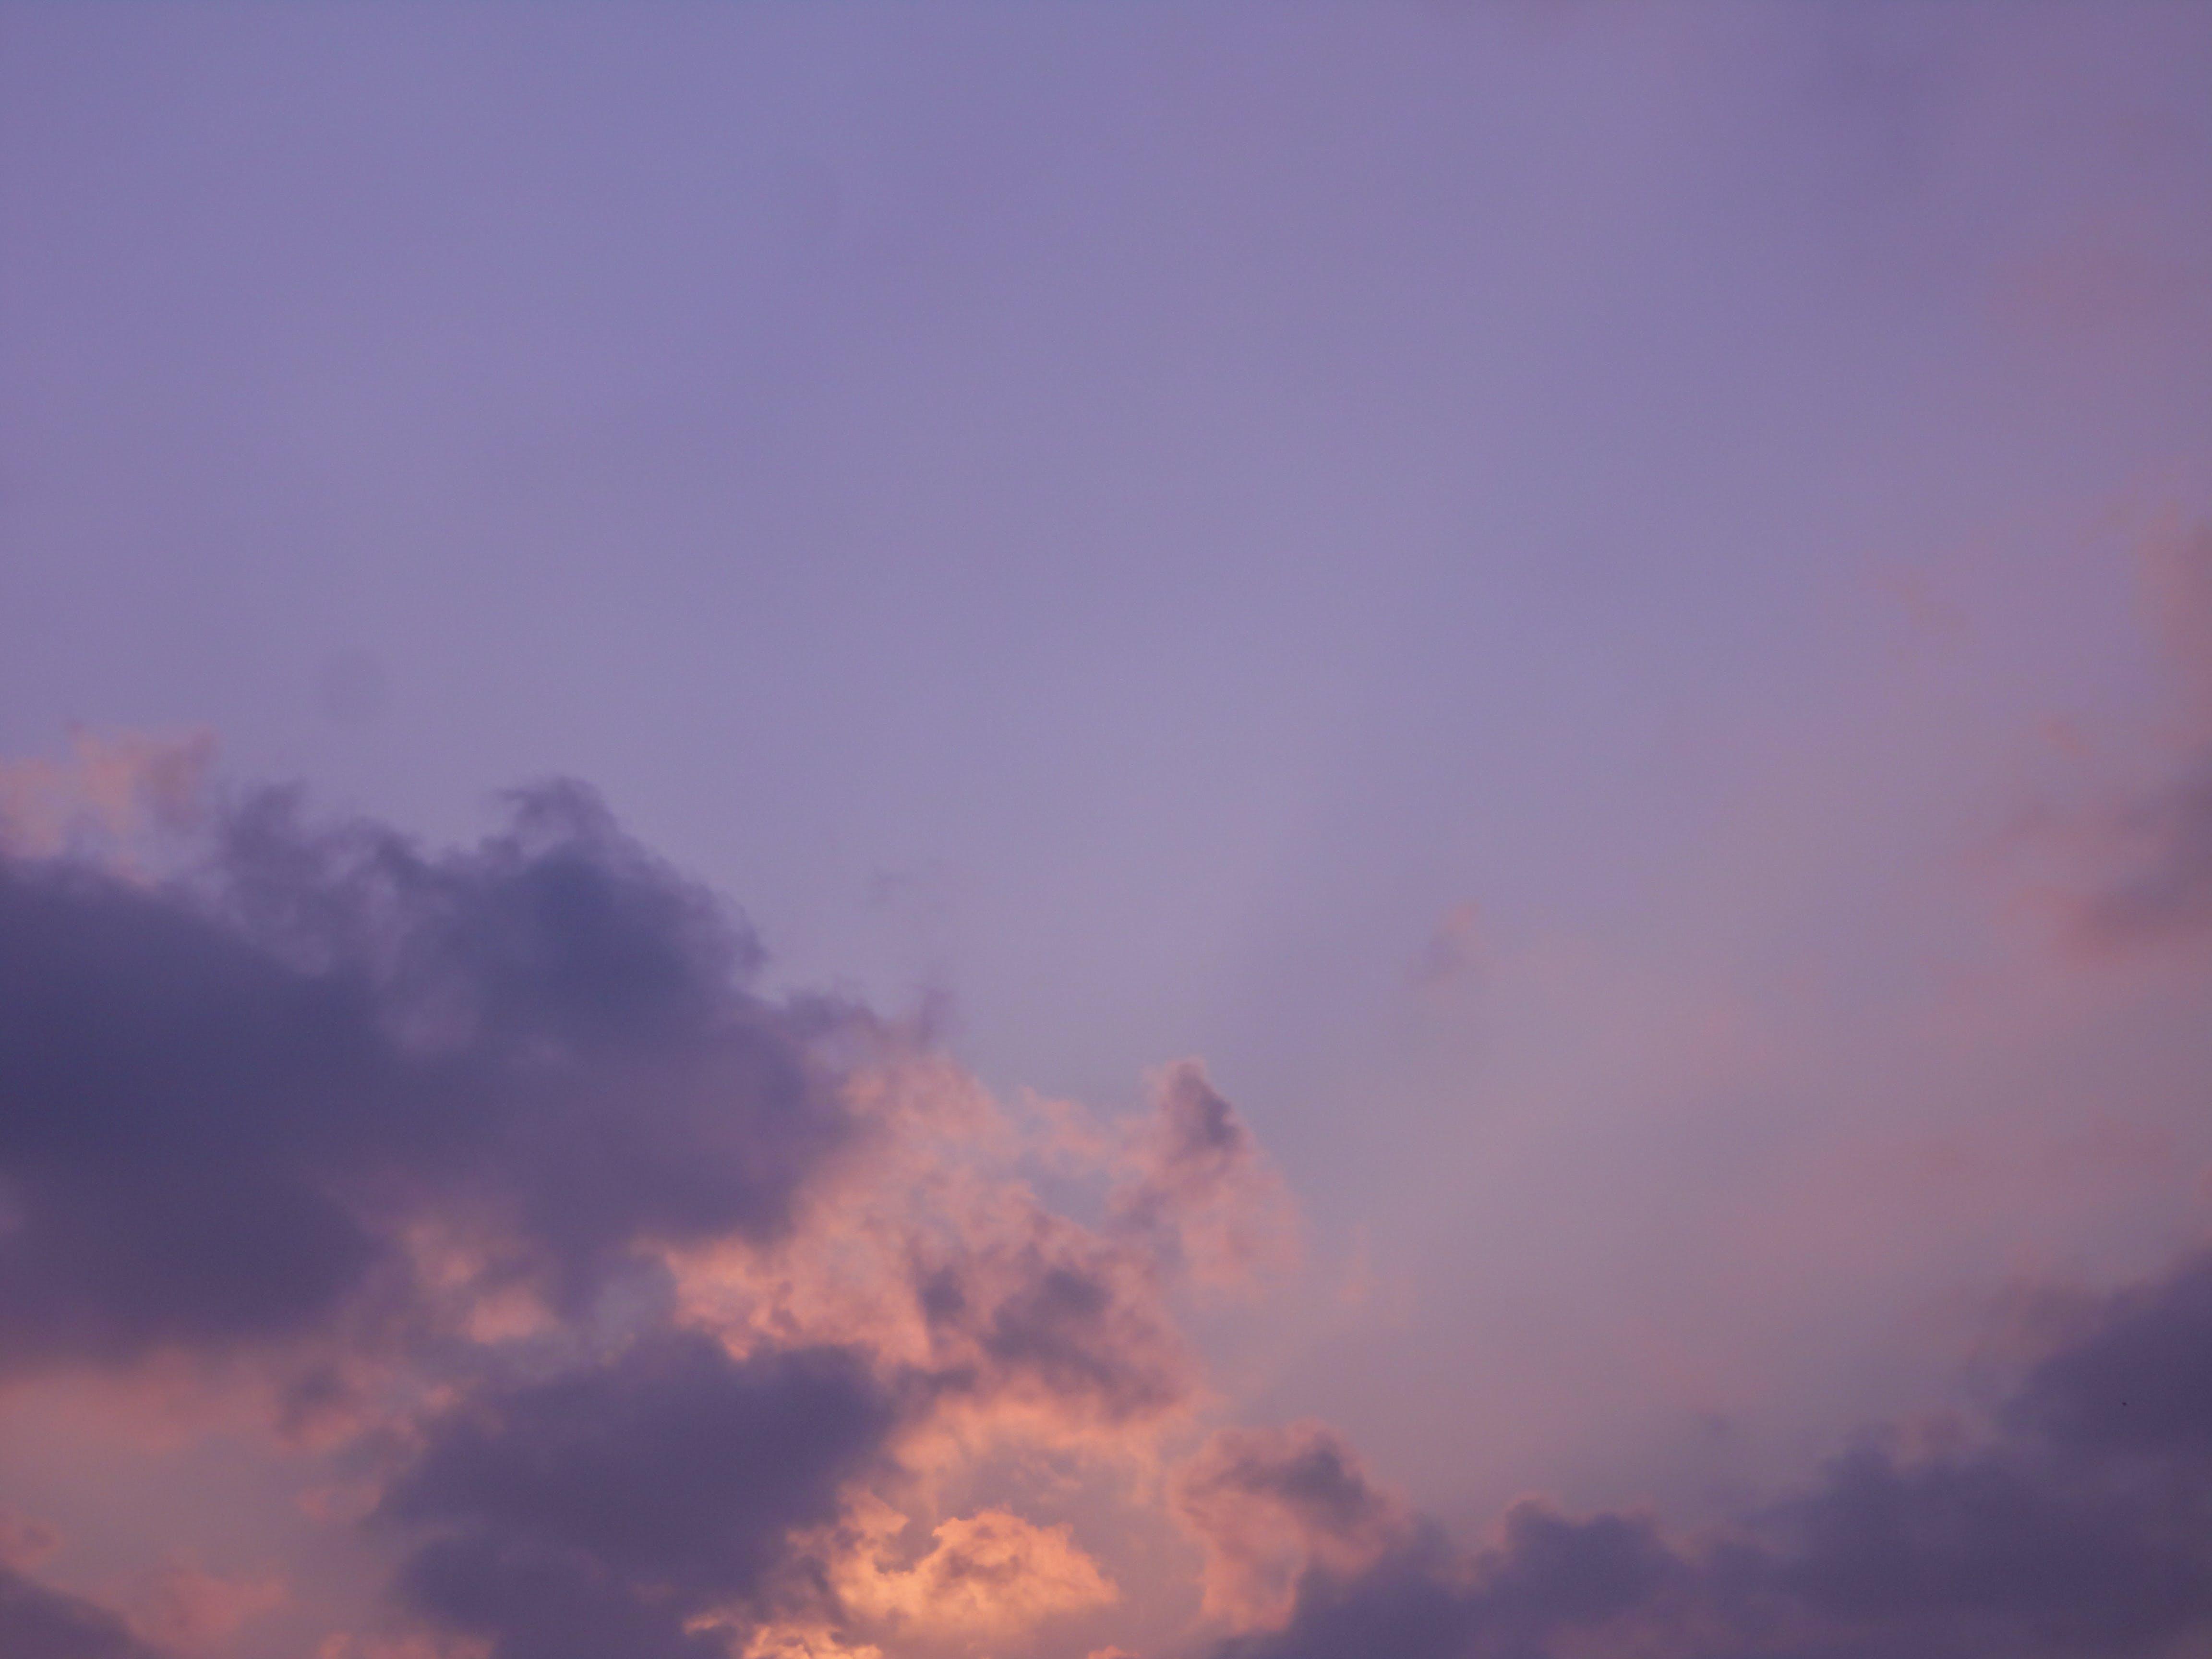 Free stock photo of nature, sunset, clouds, purple